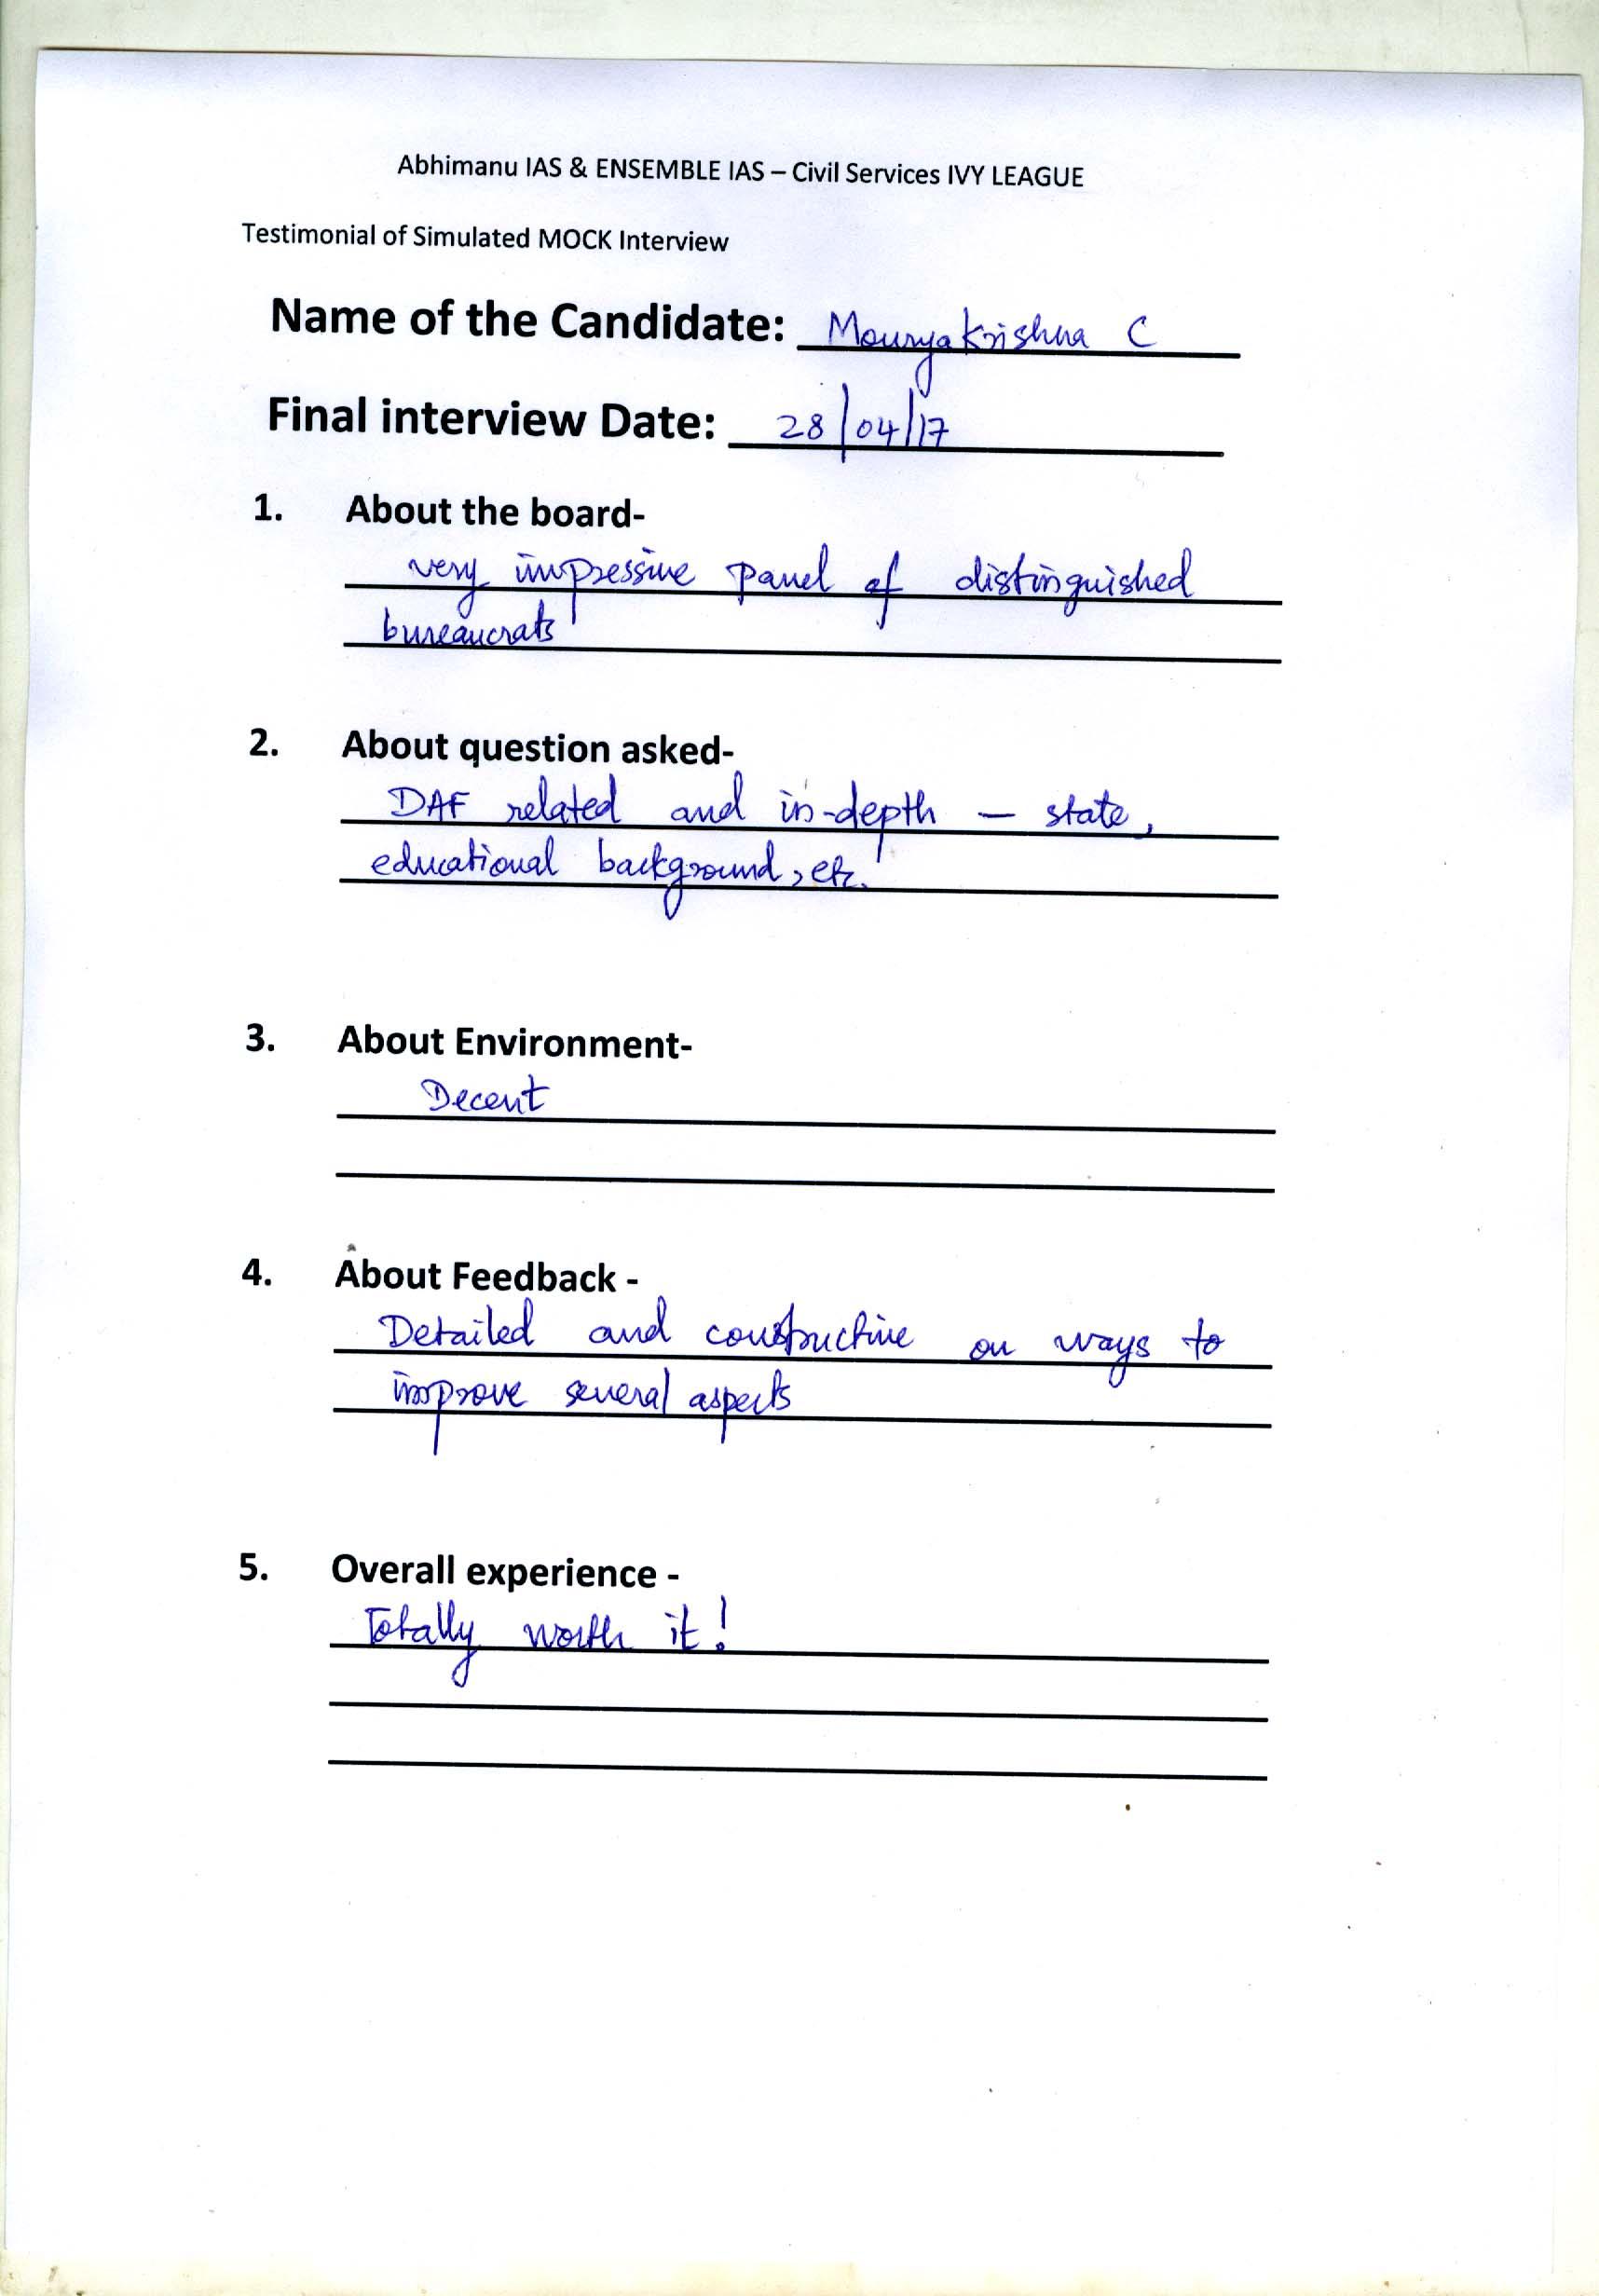 Interview Testimonial By- Maurya Krishna